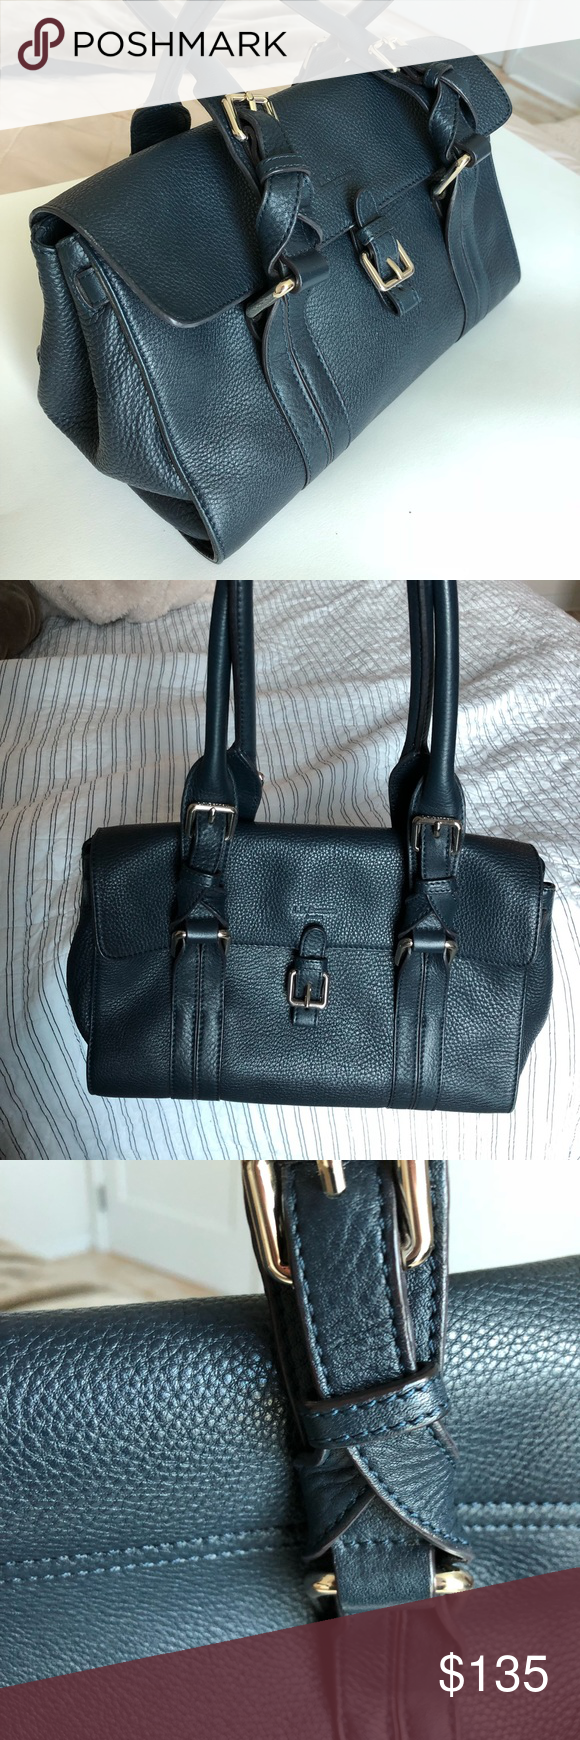 e5a2439c2d4d L. K. Bennett genuine pebbled leather  Emma  bag Beautiful medium-sized L.K.  Bennett genuine